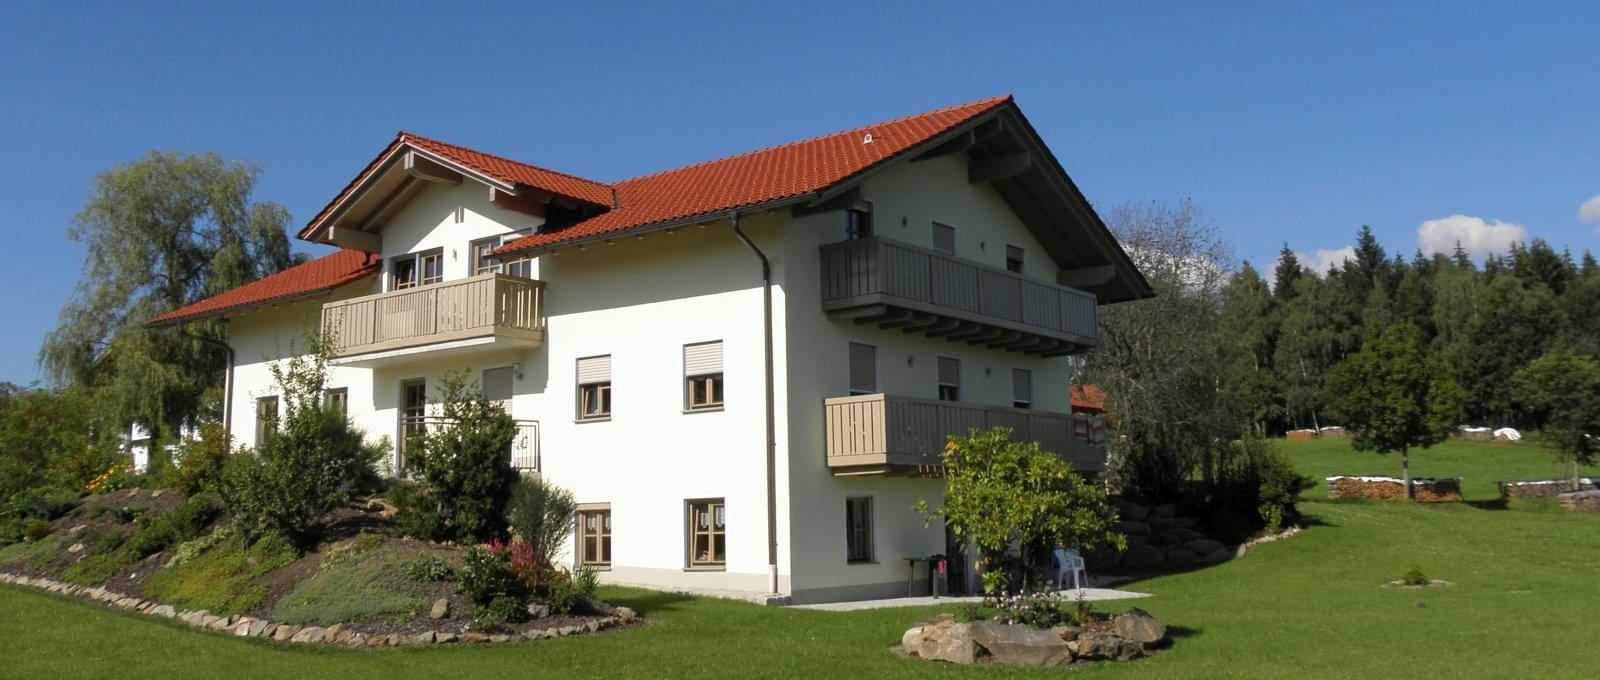 kopp-panoramabilder-ferienhaus-bayerischer-wald-ansicht-panorama